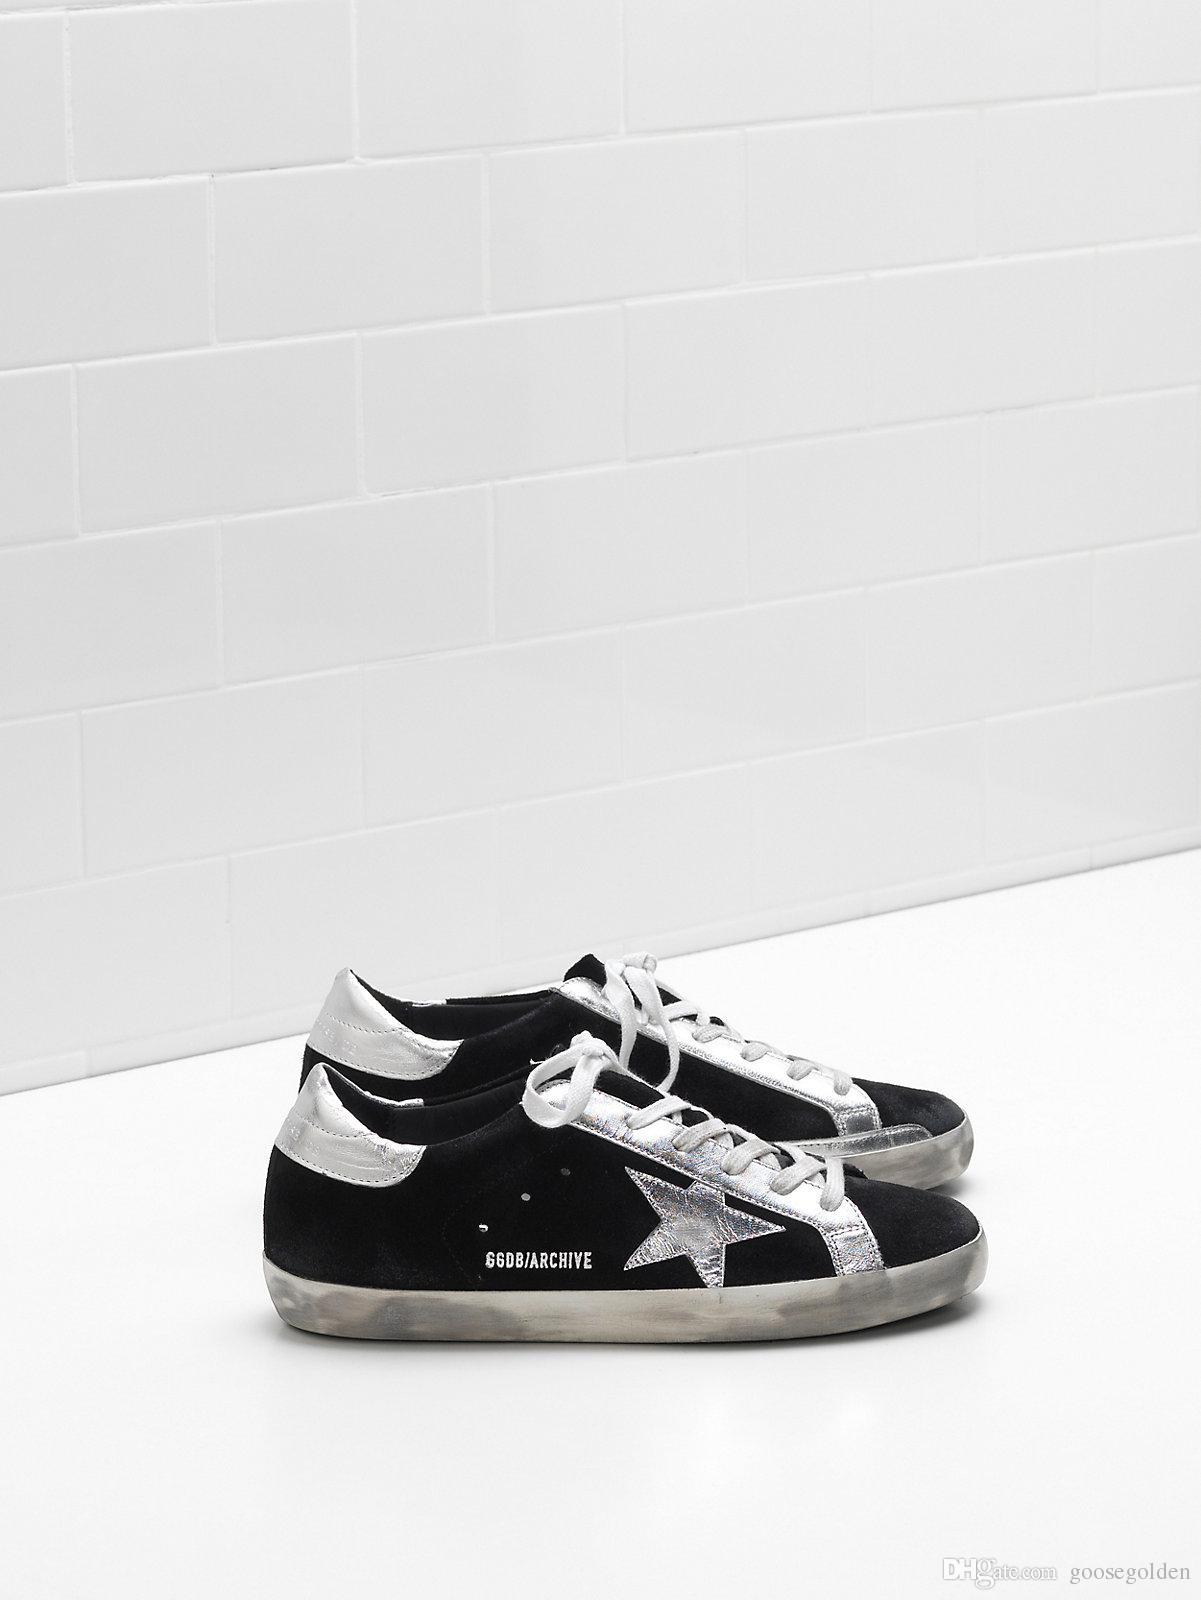 Heel Schuhe Stern Und Metallic Archive Details Tab Echtem Superstar Oberen Aus Italien Kalbsleder Marke Sneakers Großhandel In Leder A5L4j3Rq